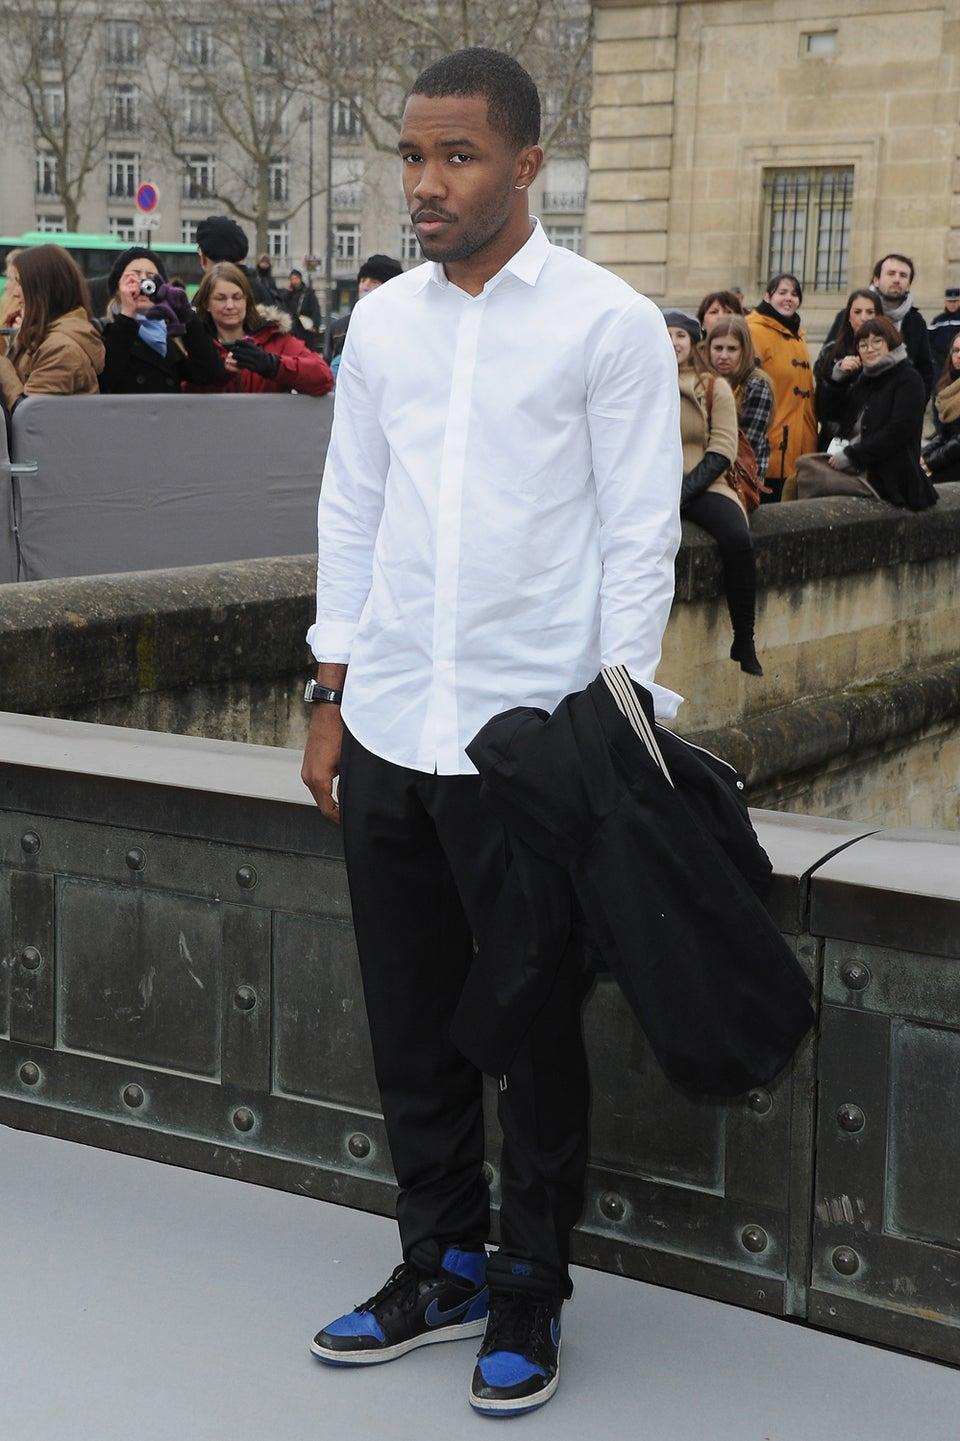 Coffee Talk: Frank Ocean Sued Over Song, 'Lost'